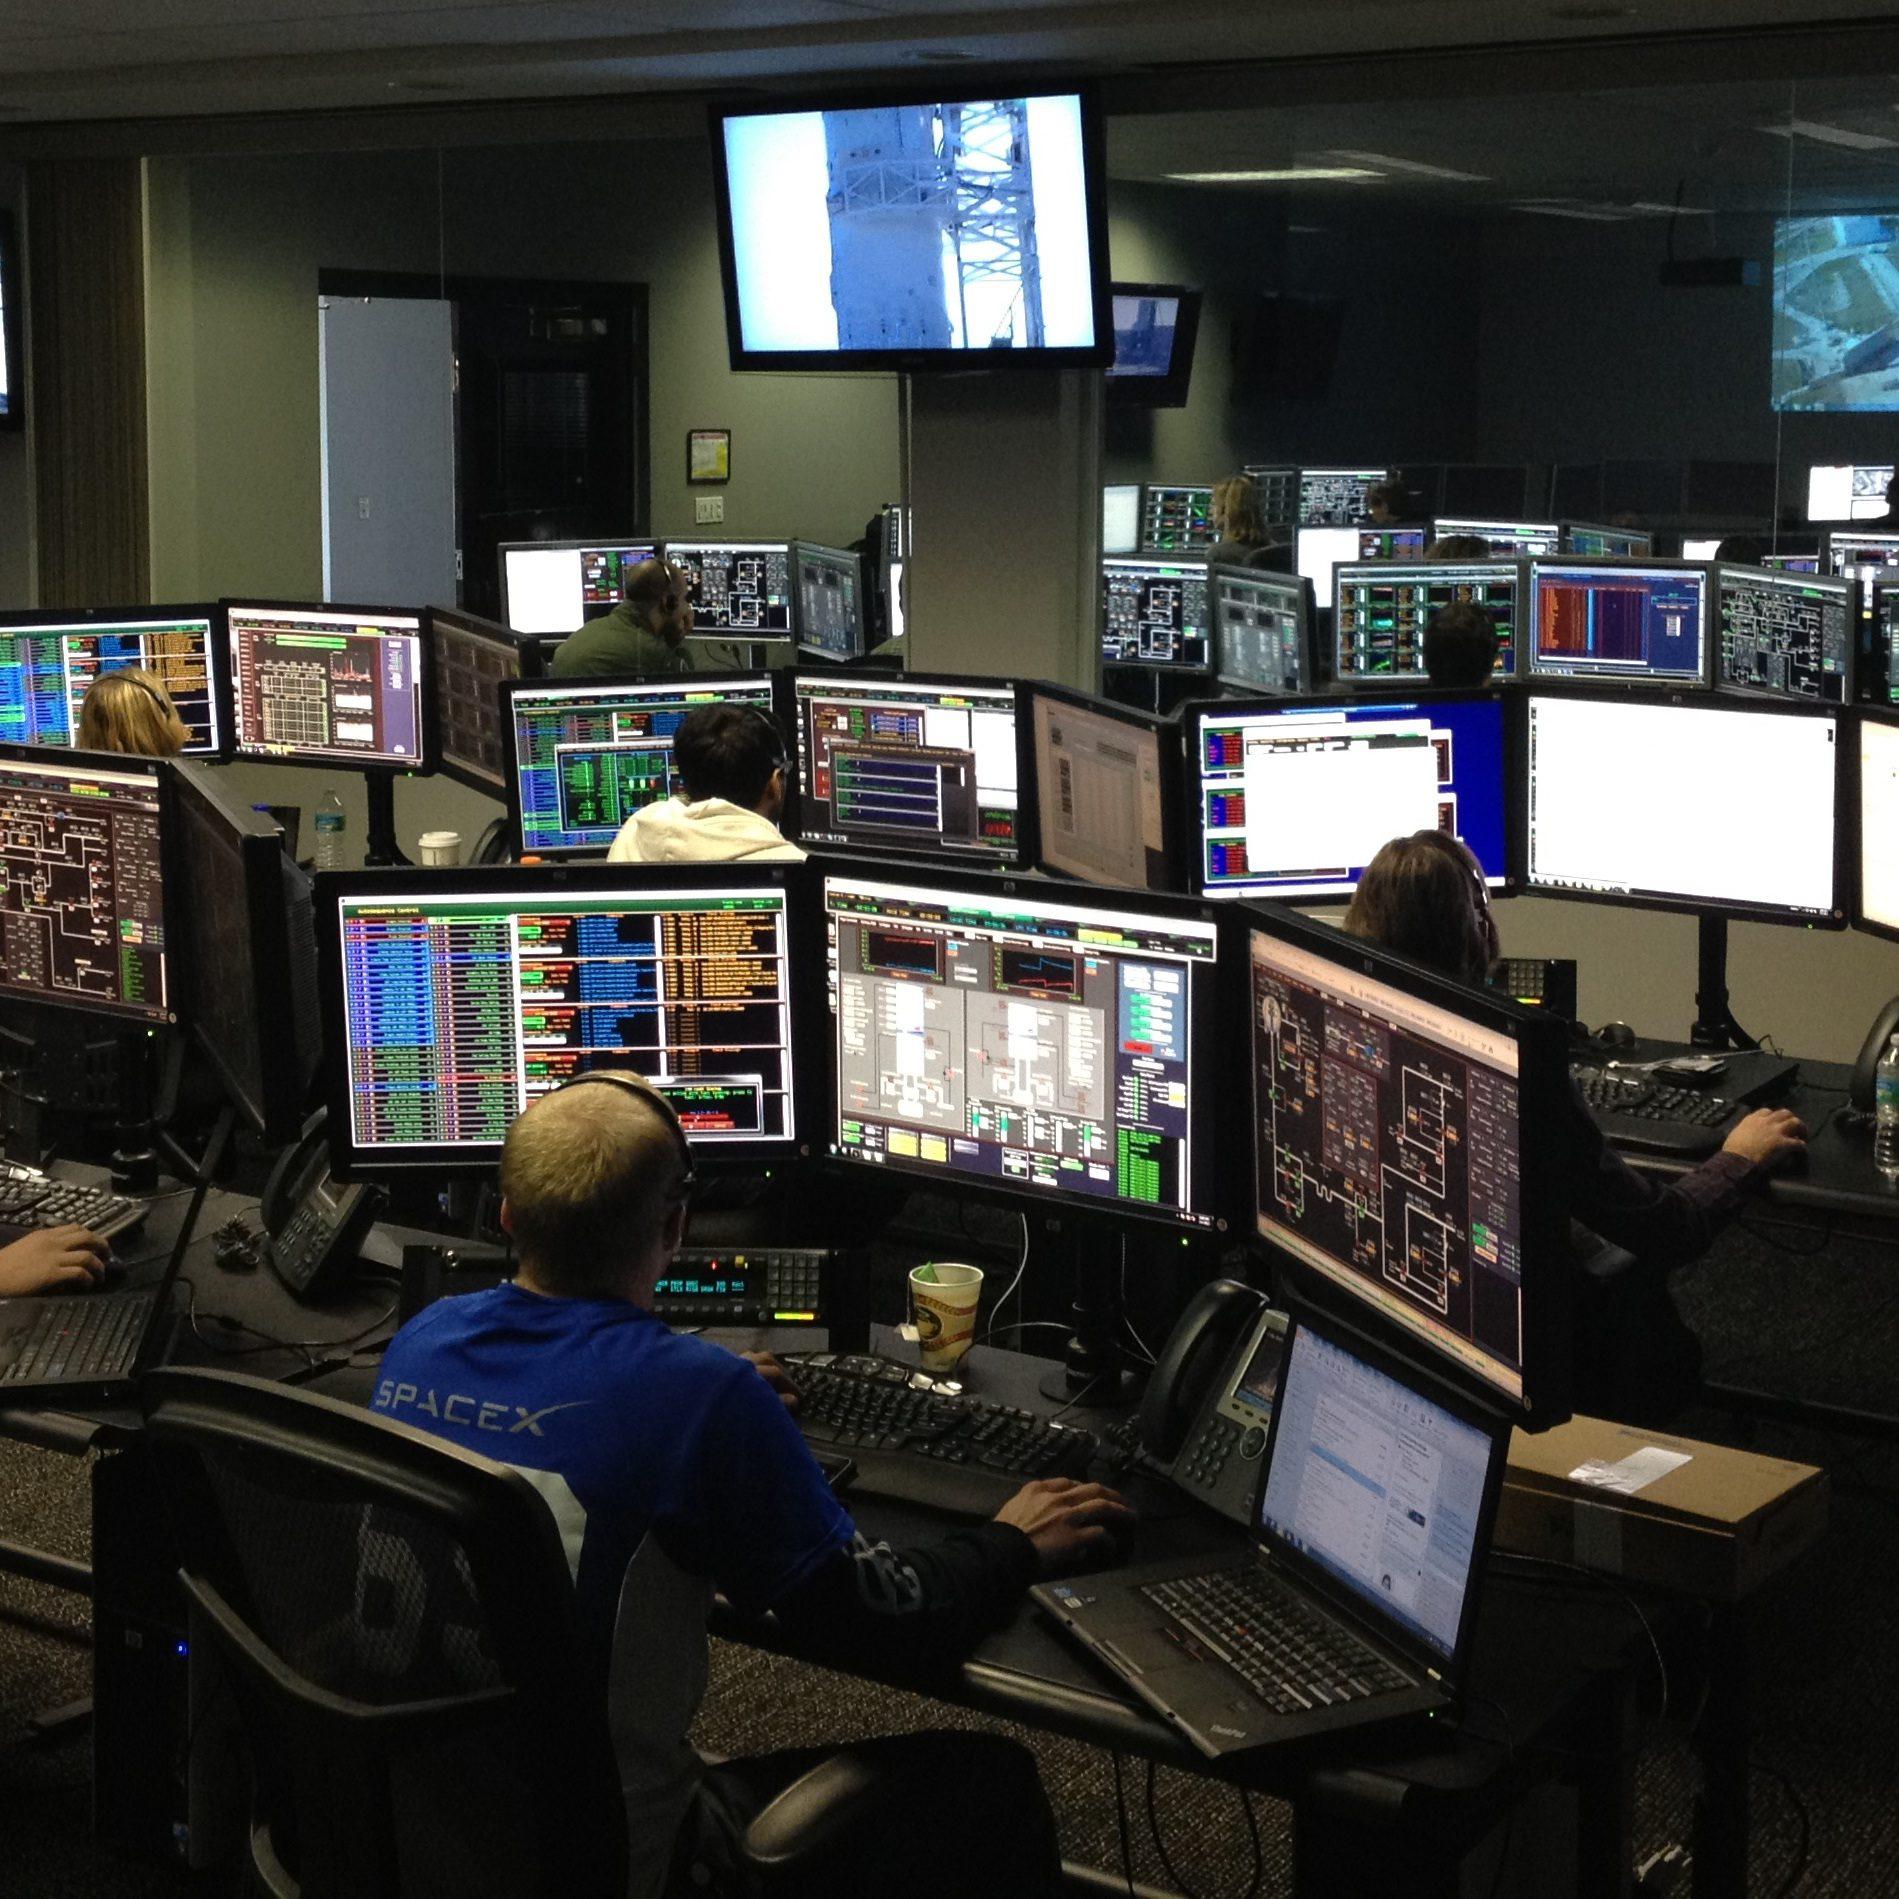 space-center-693251